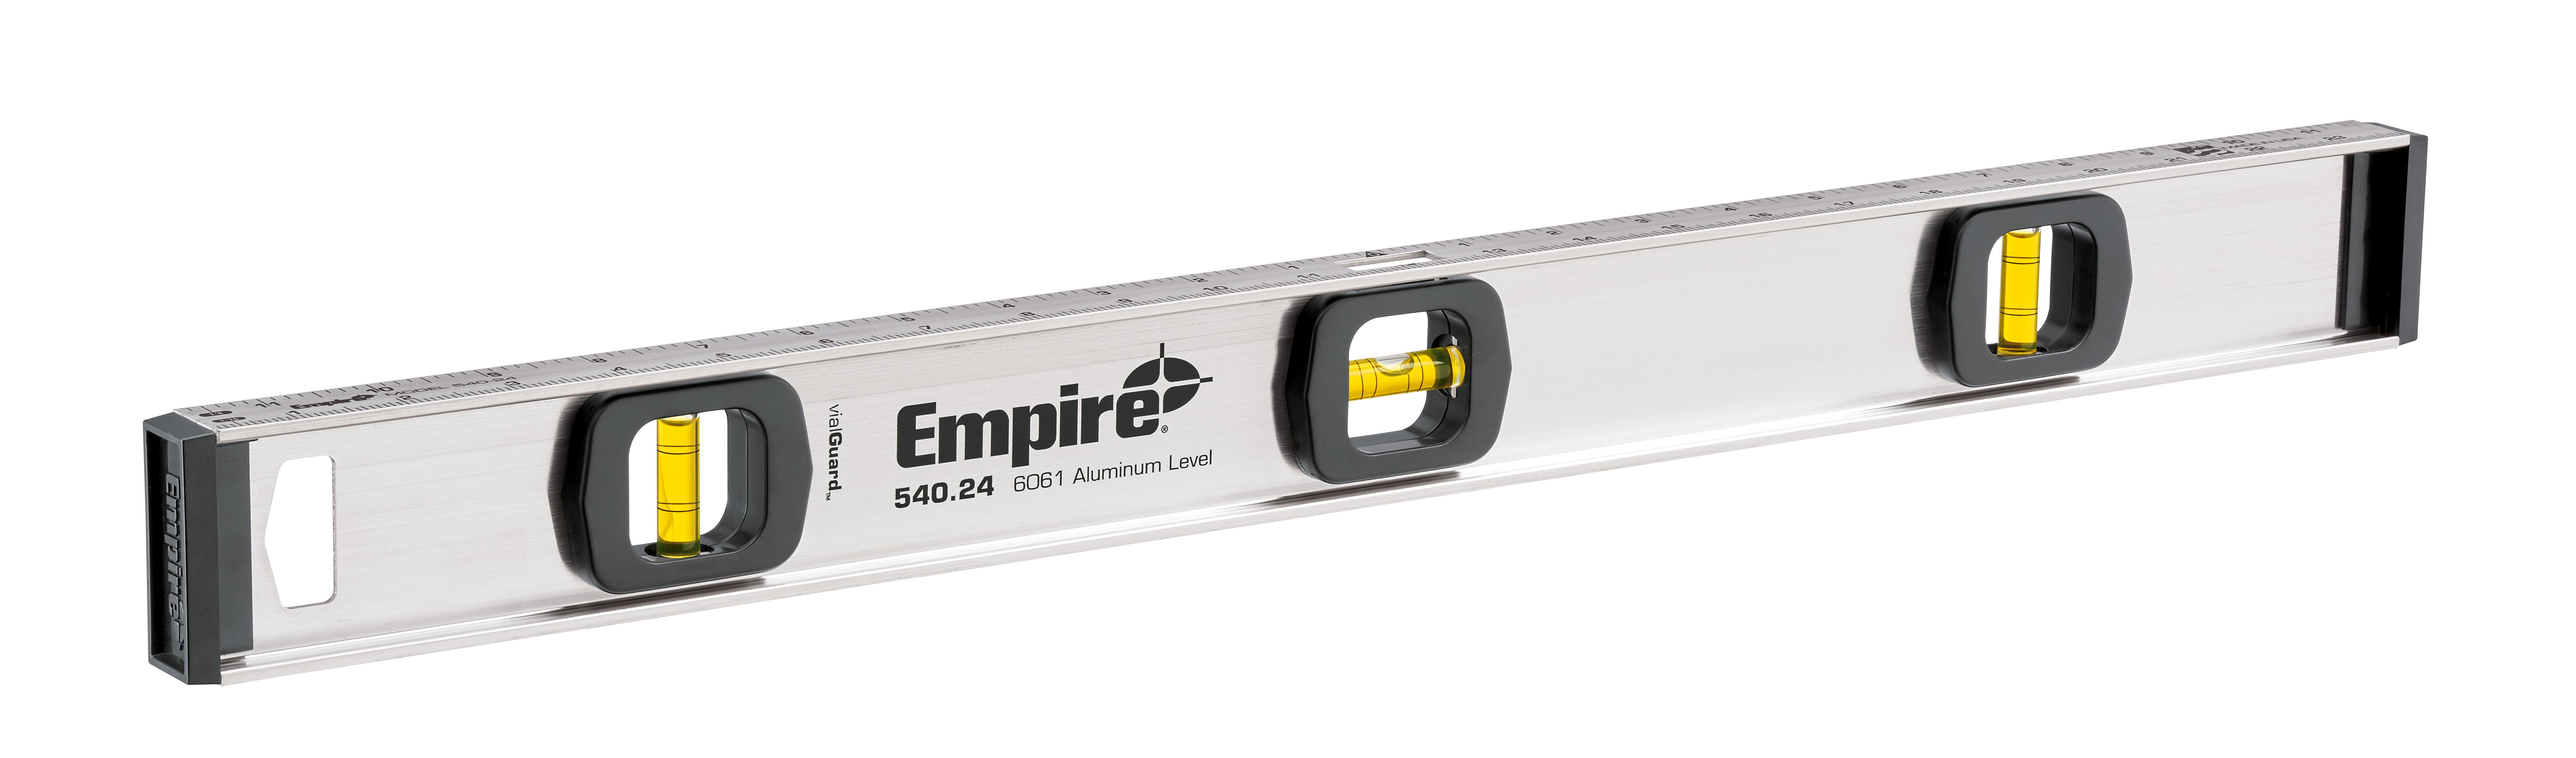 Milwaukee® Empire® 540-24 Tradesman's I-Beam Level, 24 in L, 3 Vials, Aluminum, (1) Level, (2) Plumb Vial Position, 0.001 in Accuracy